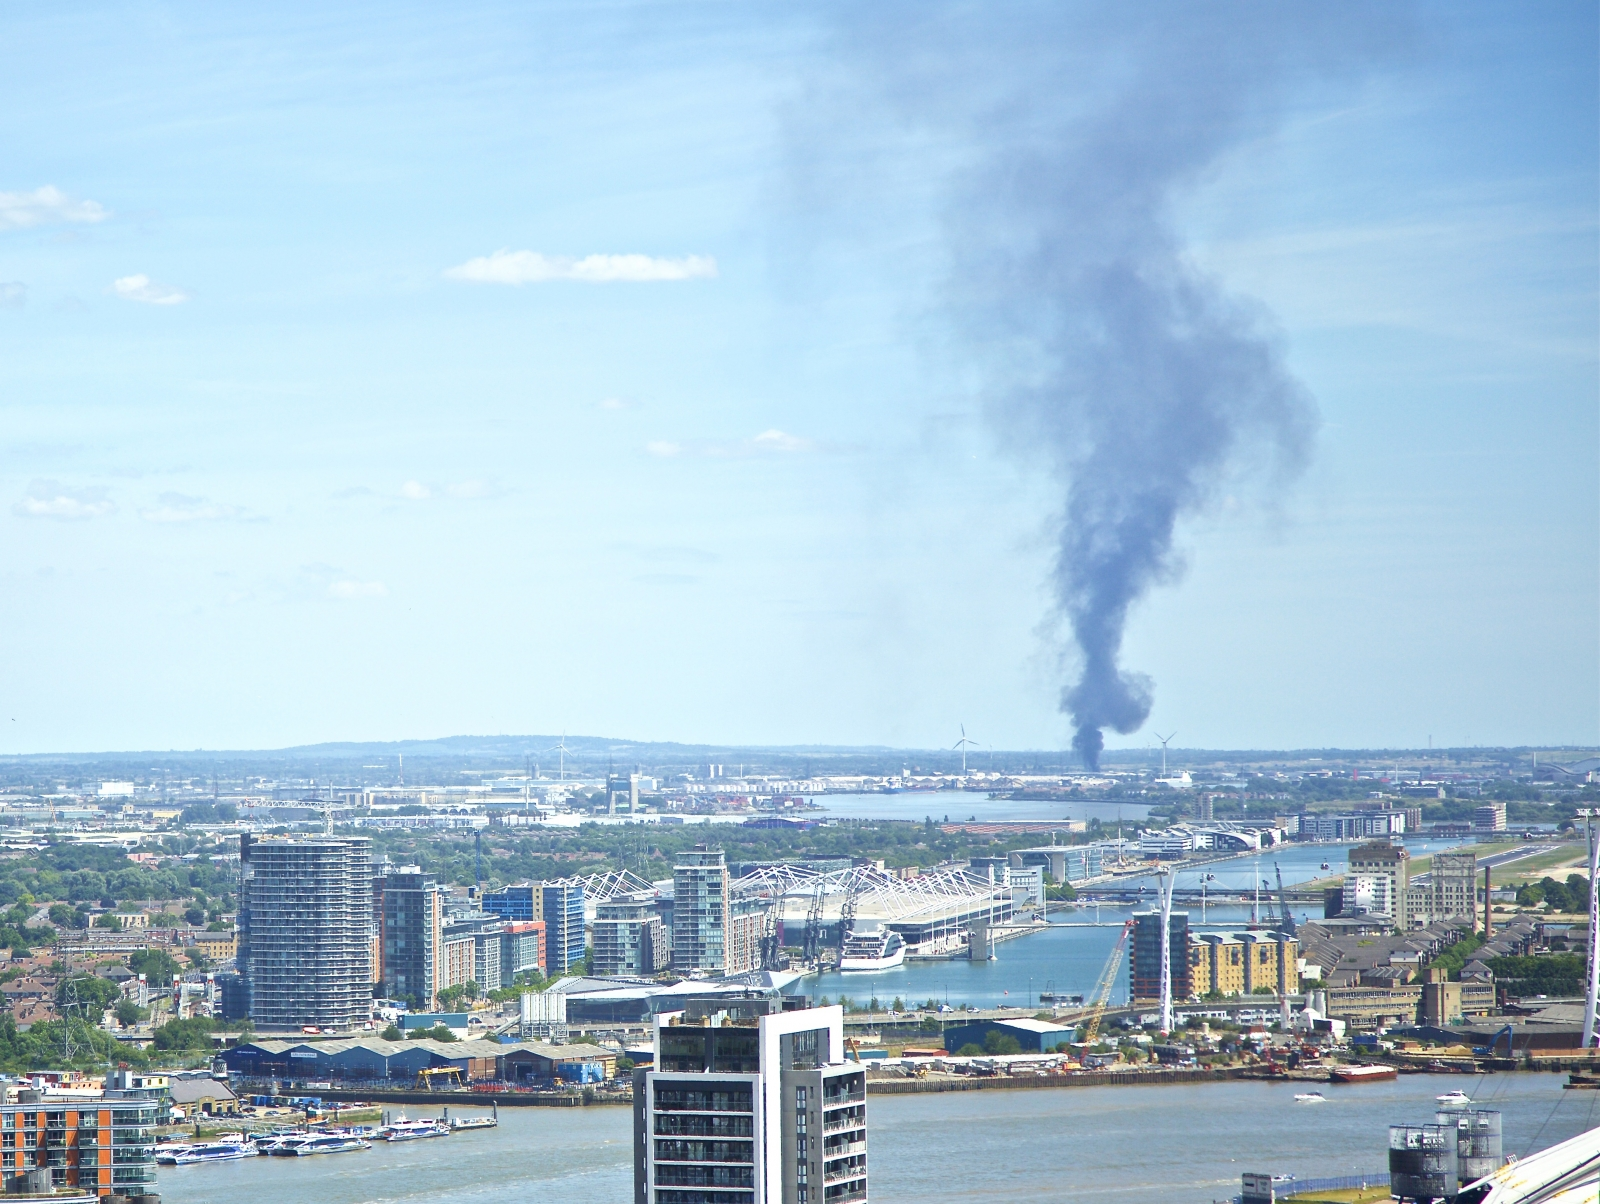 London fire: Rainham vehicle yard blaze sends black smoke rising over capital